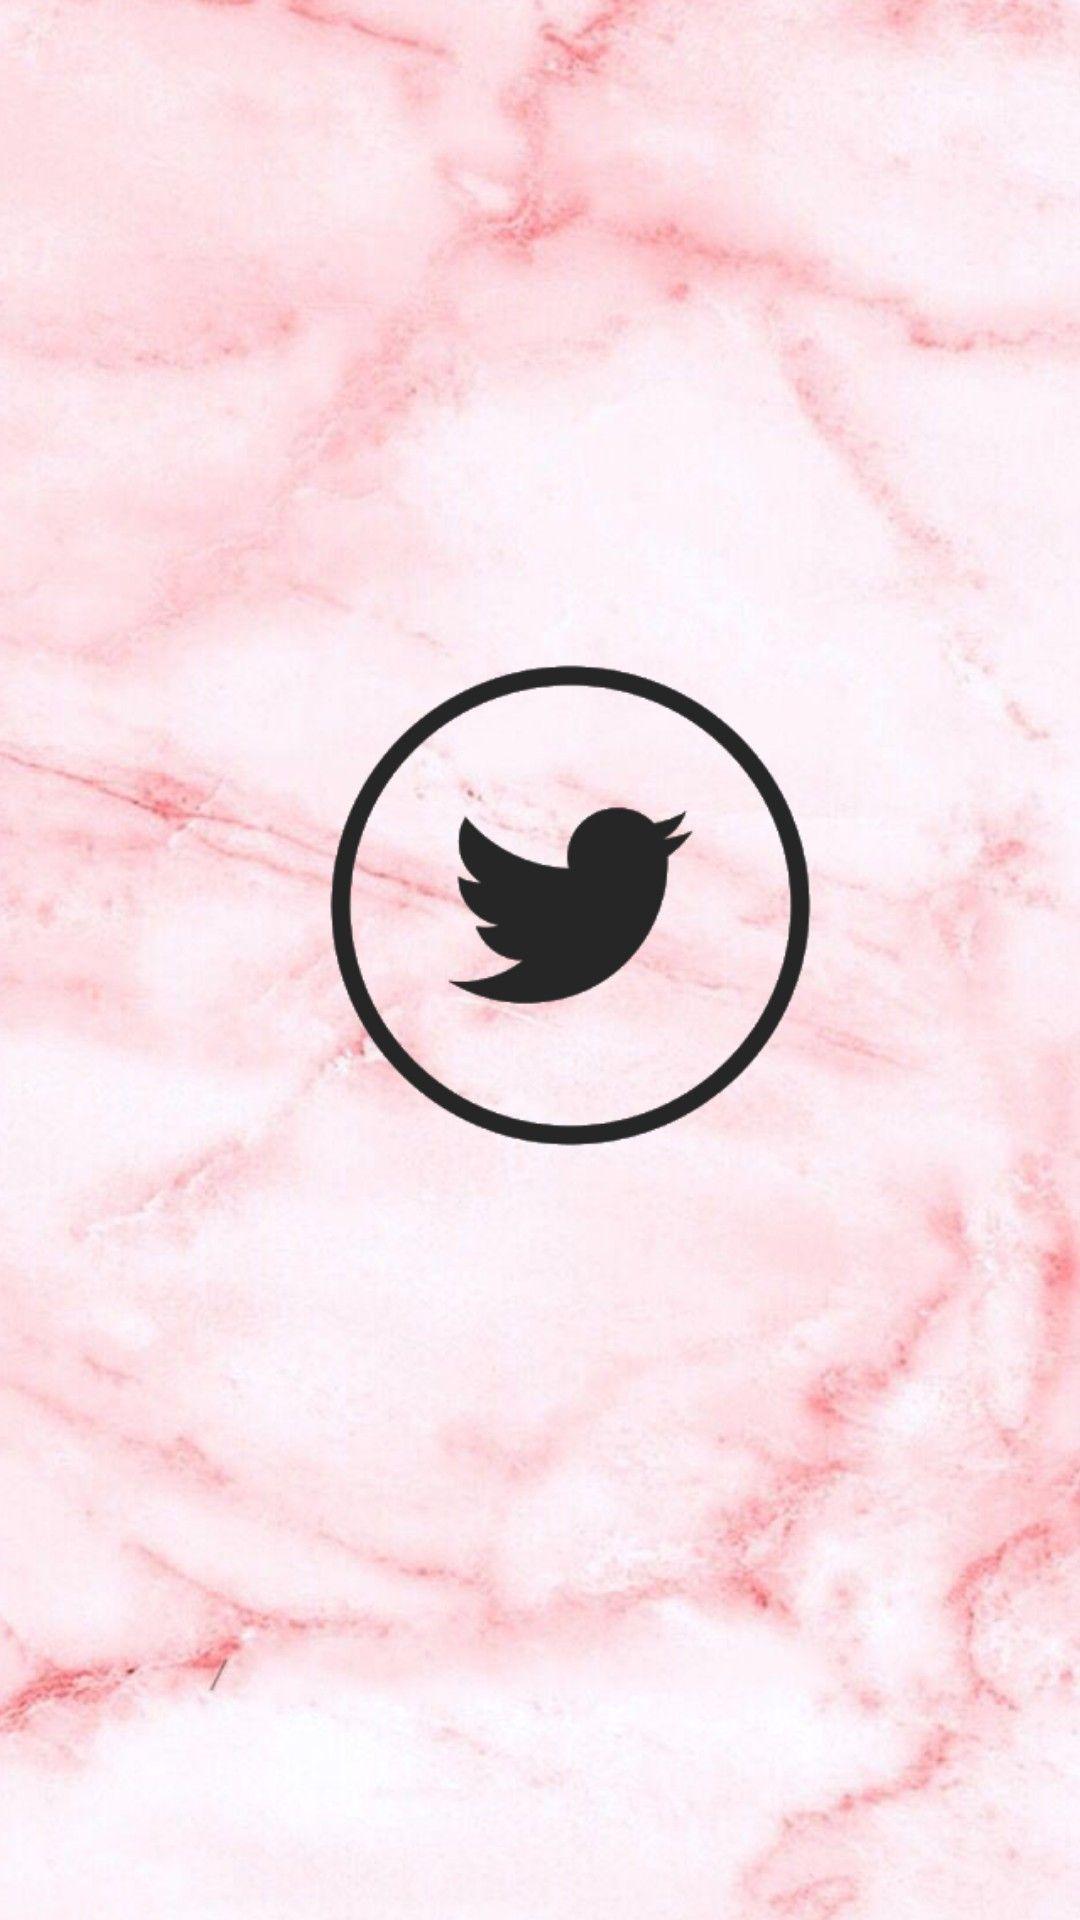 Fundos, Logotipo Instagram, Ícones De Destaque Do